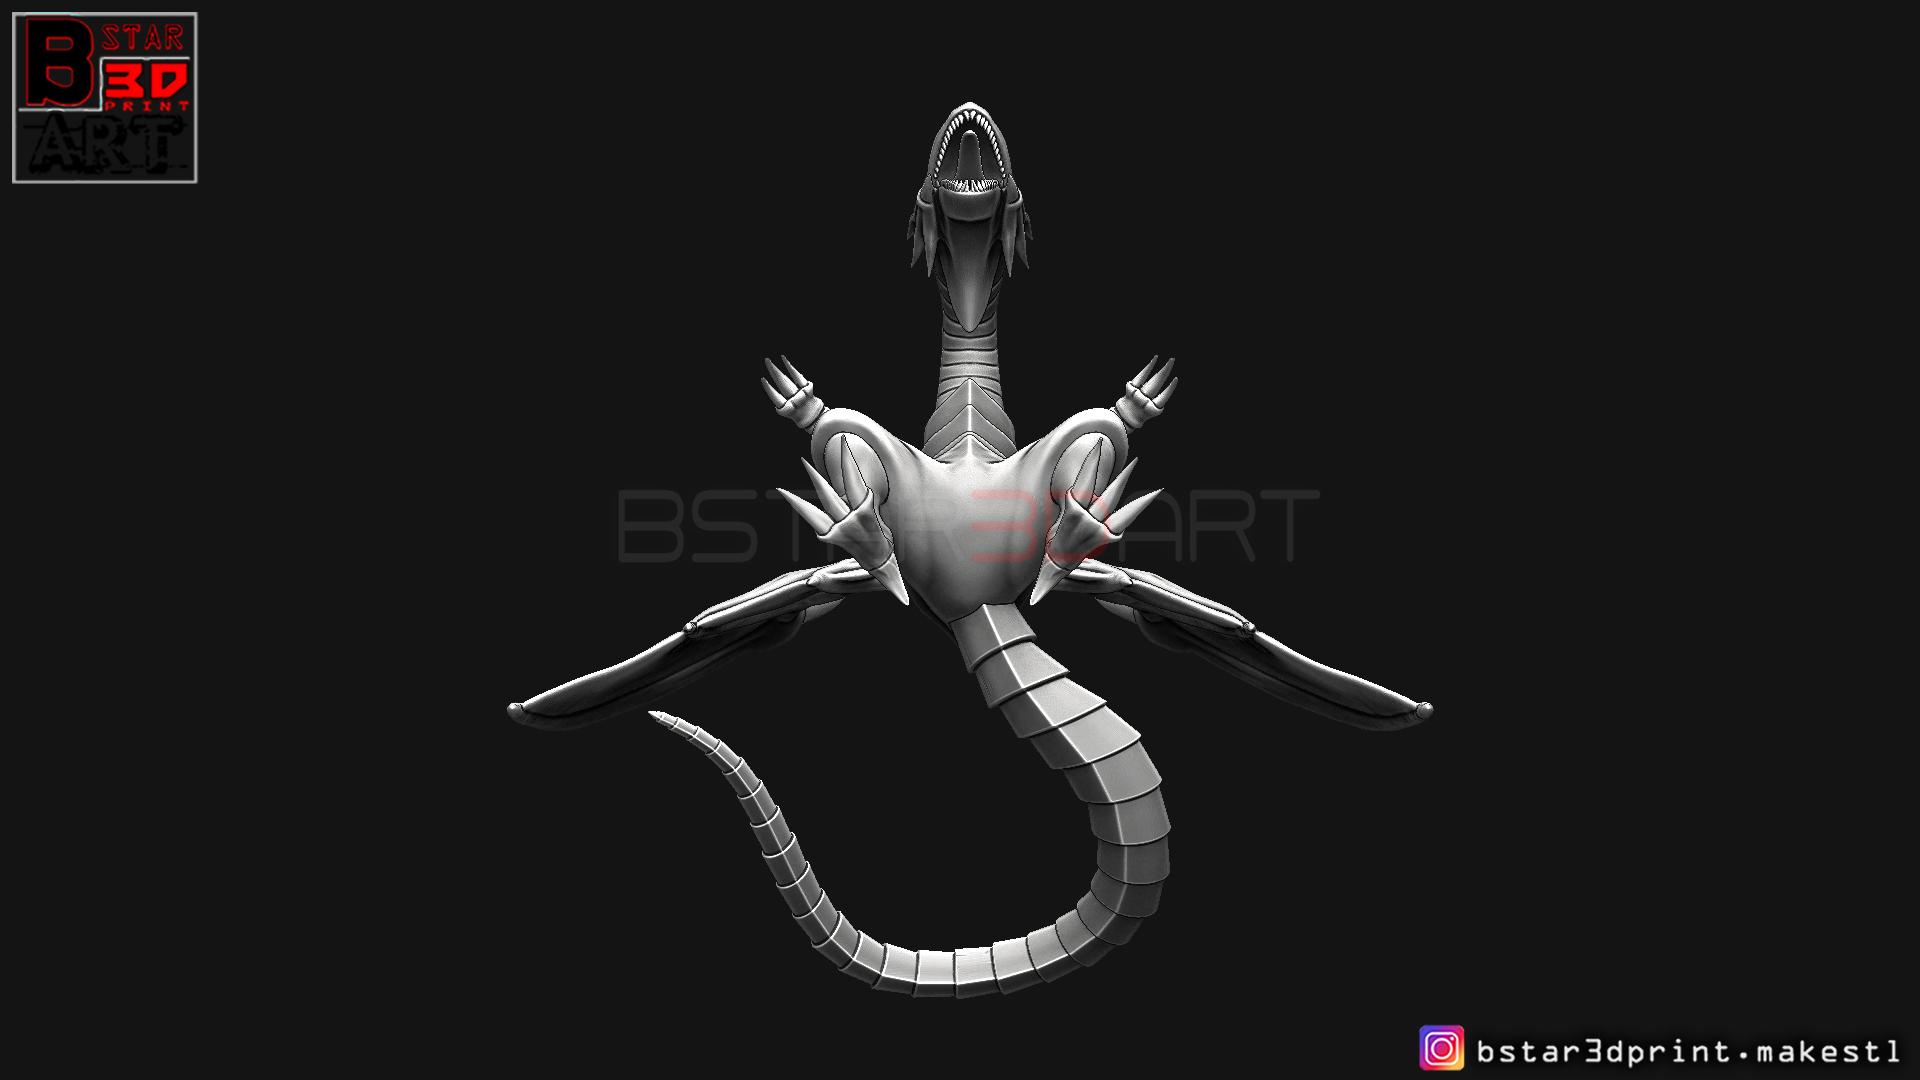 07.jpg Télécharger fichier STL yeux bleus dragon blanc - Yu Gi Oh • Modèle à imprimer en 3D, Bstar3Dart